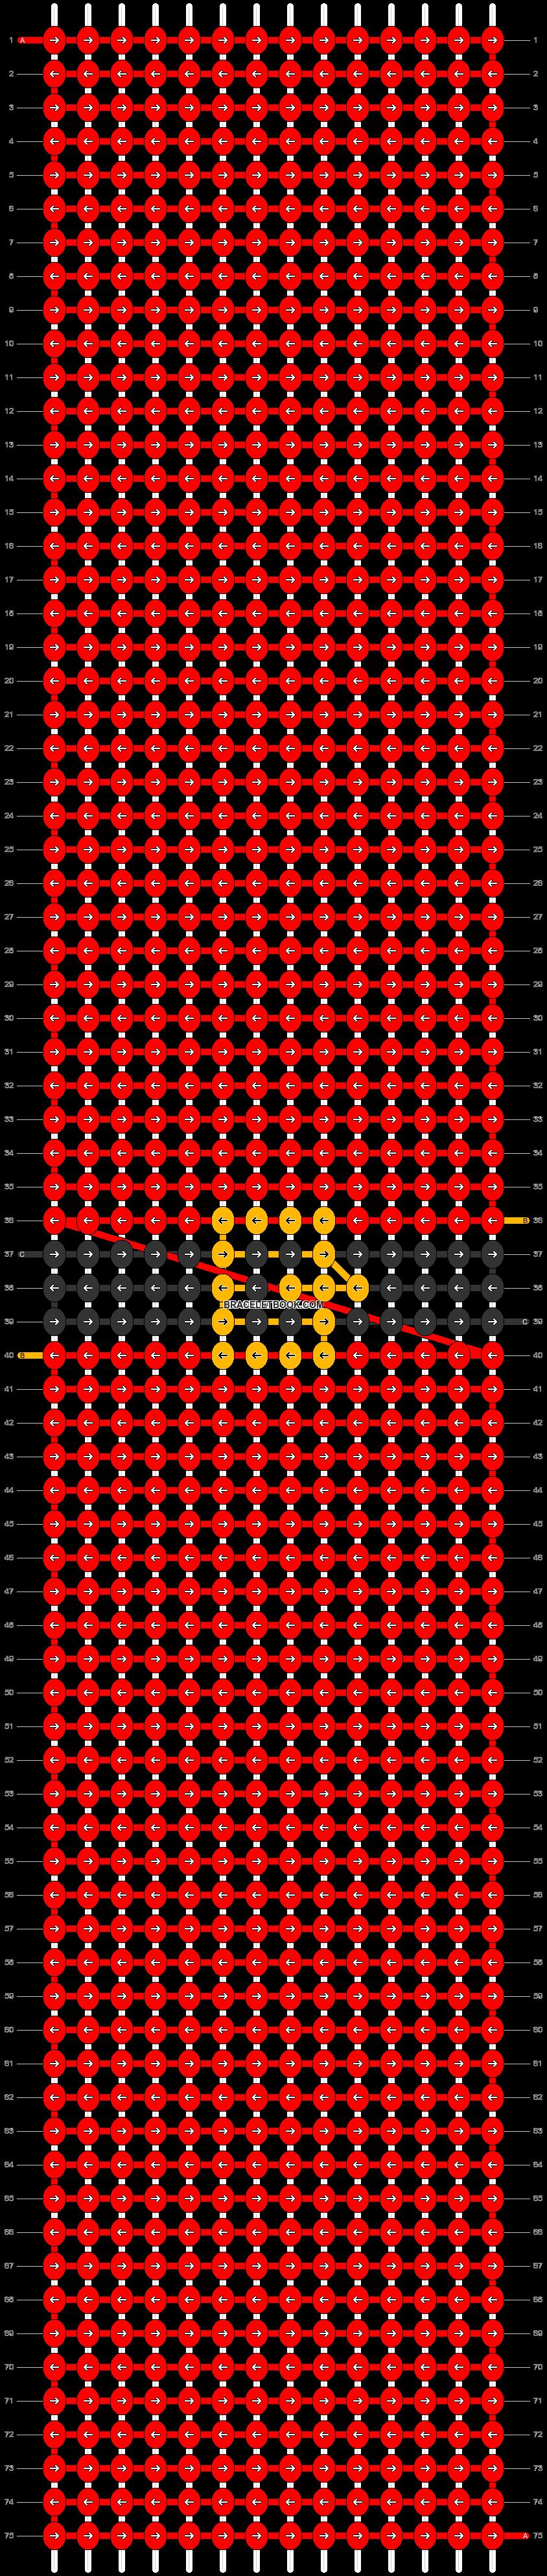 Alpha pattern #62013 pattern